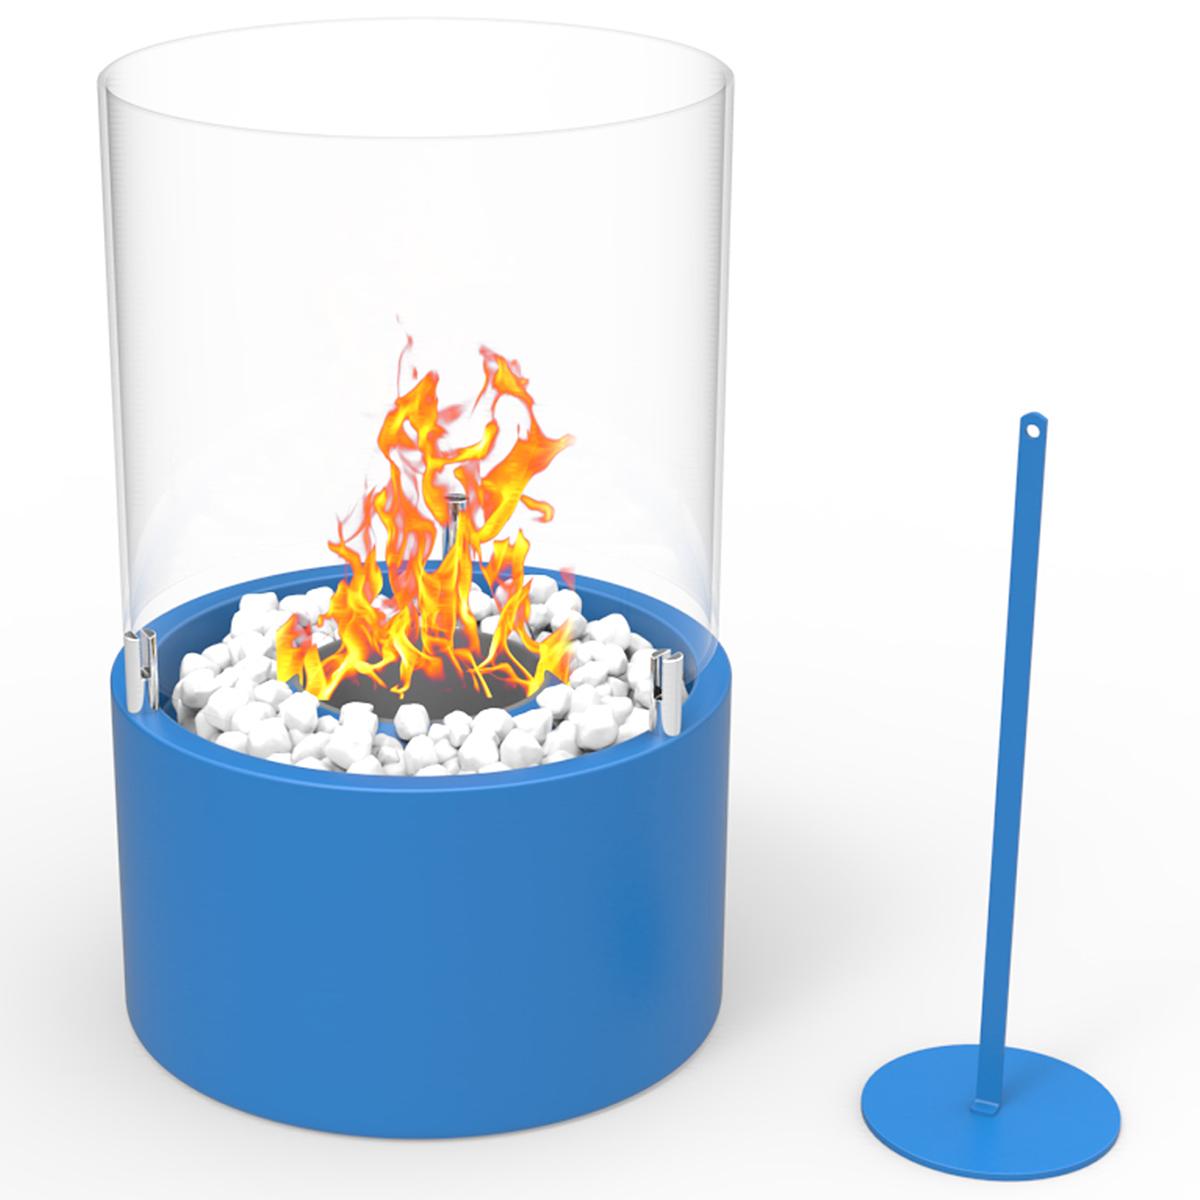 Casper Ventless Ventless Tabletop Portable Bio Ethanol